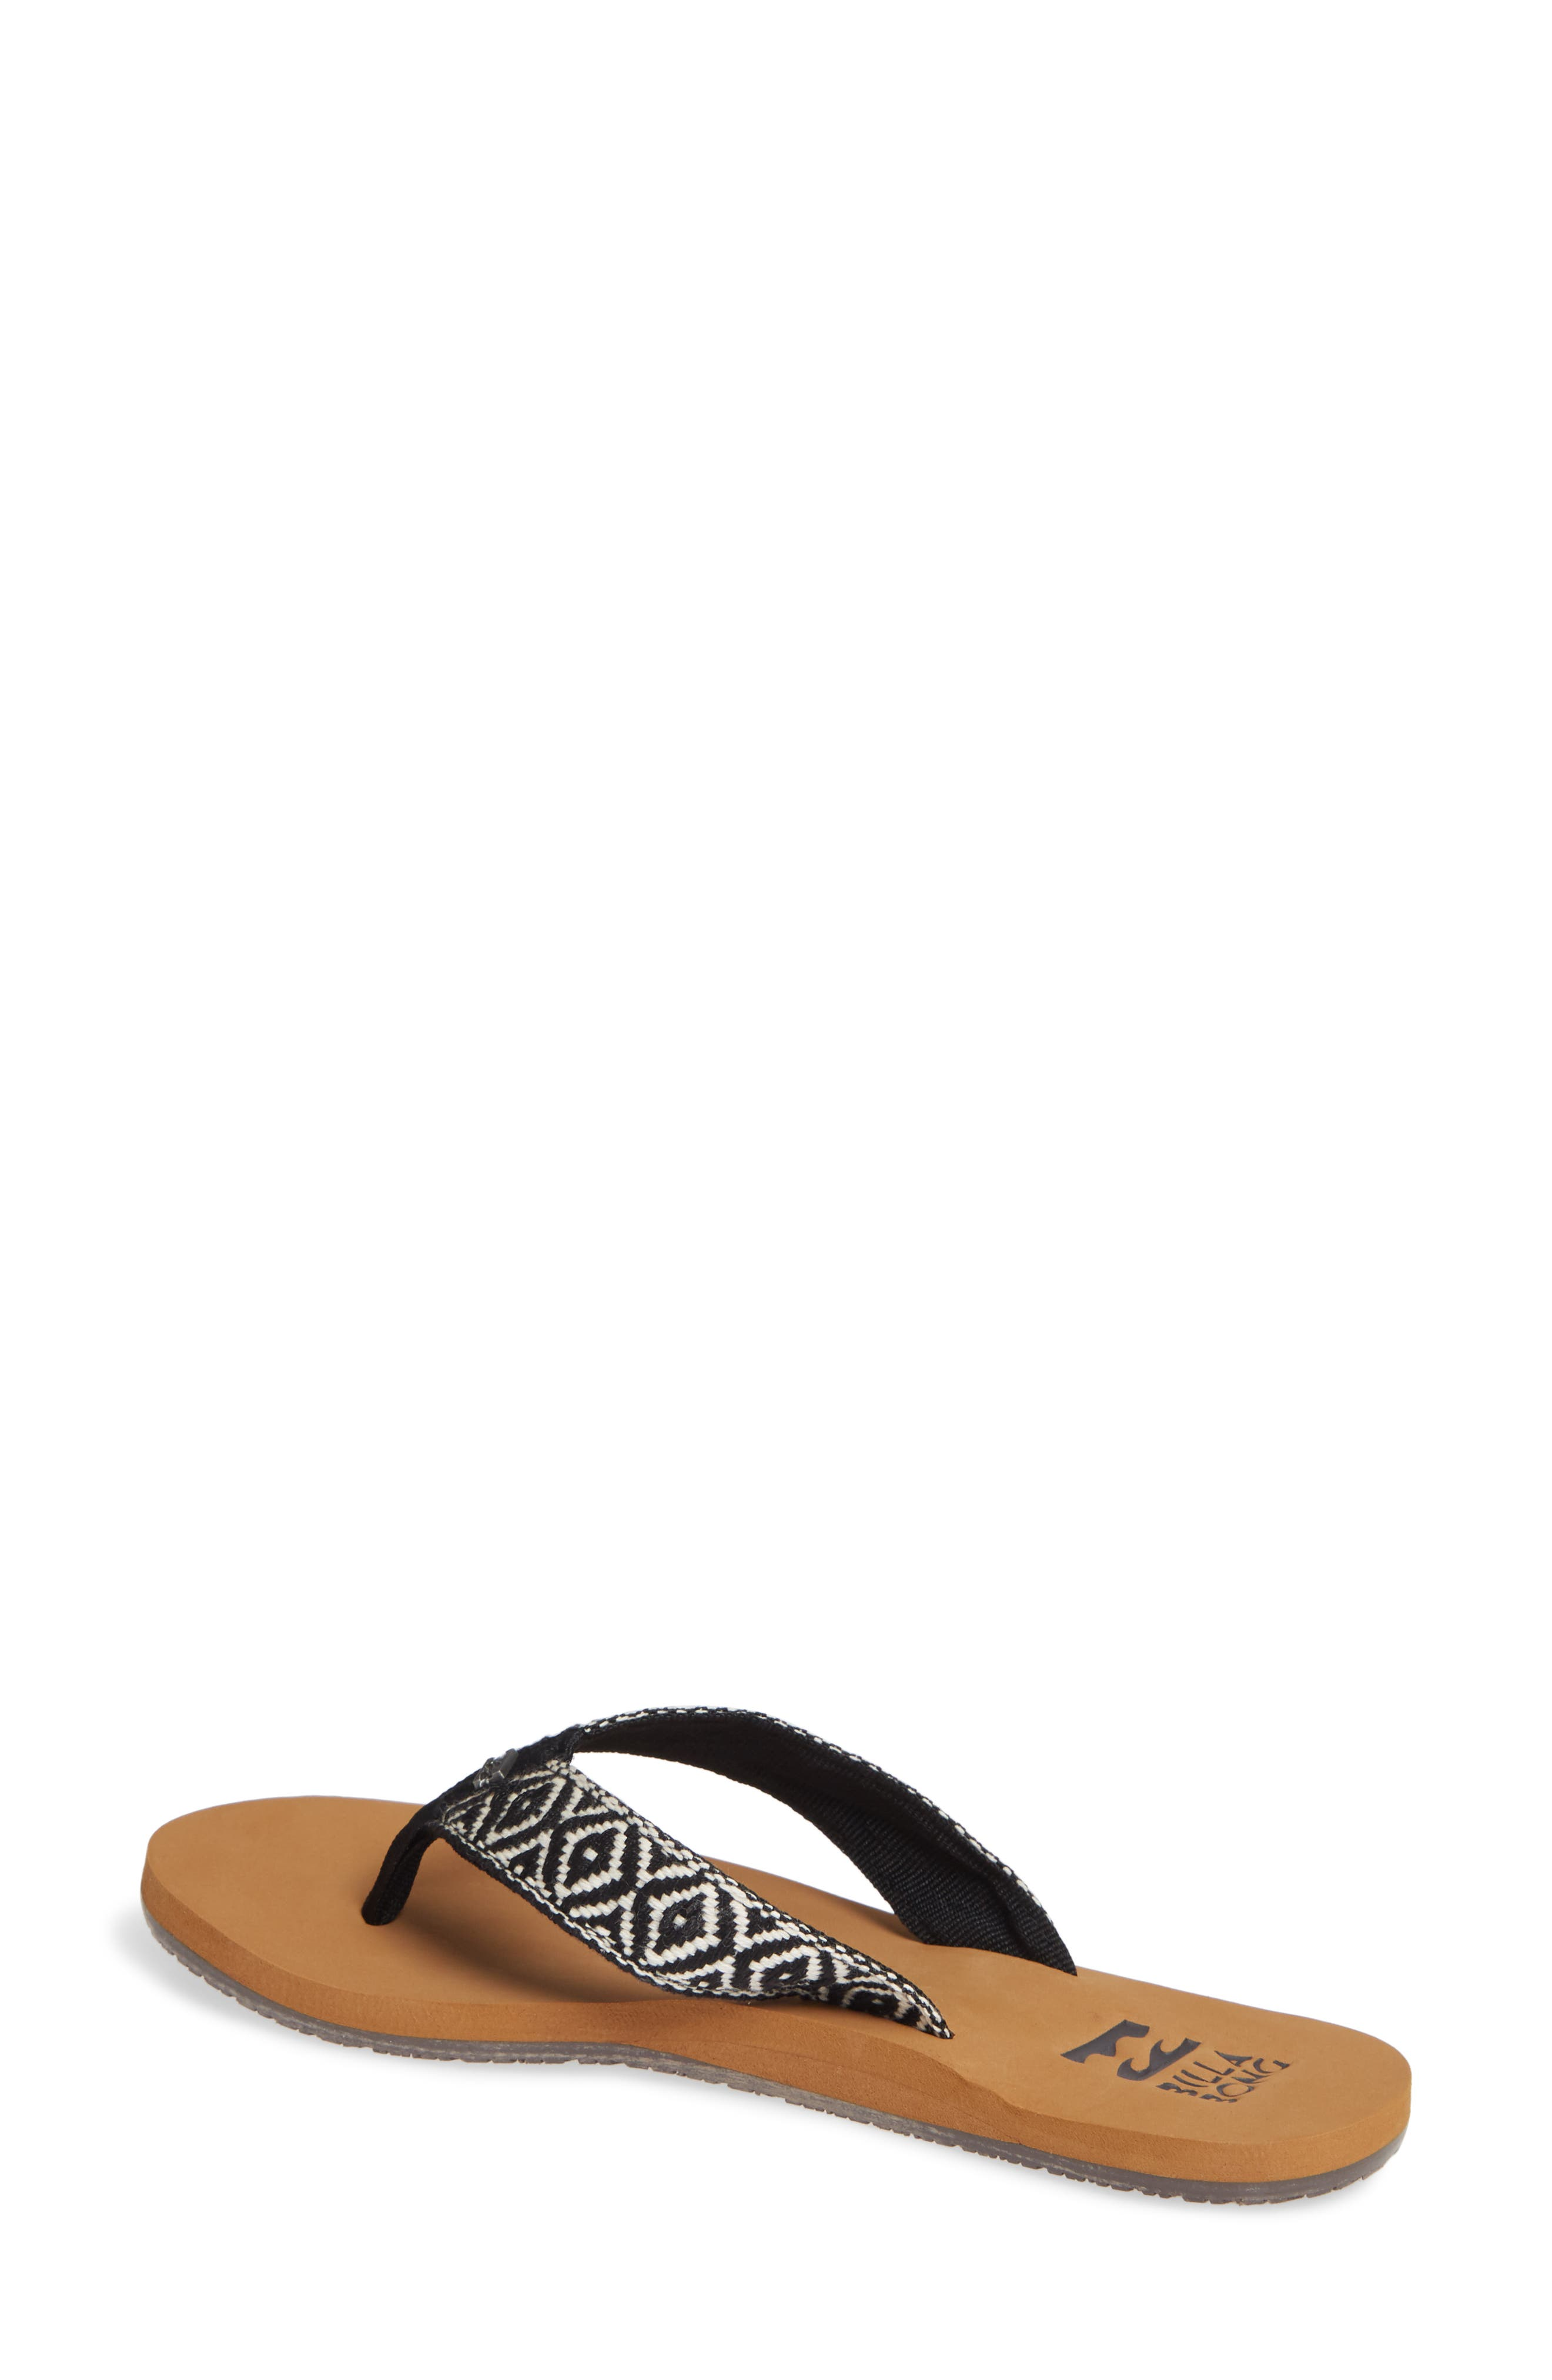 Baja Flip Flop,                             Alternate thumbnail 2, color,                             BLACK/ WHITE